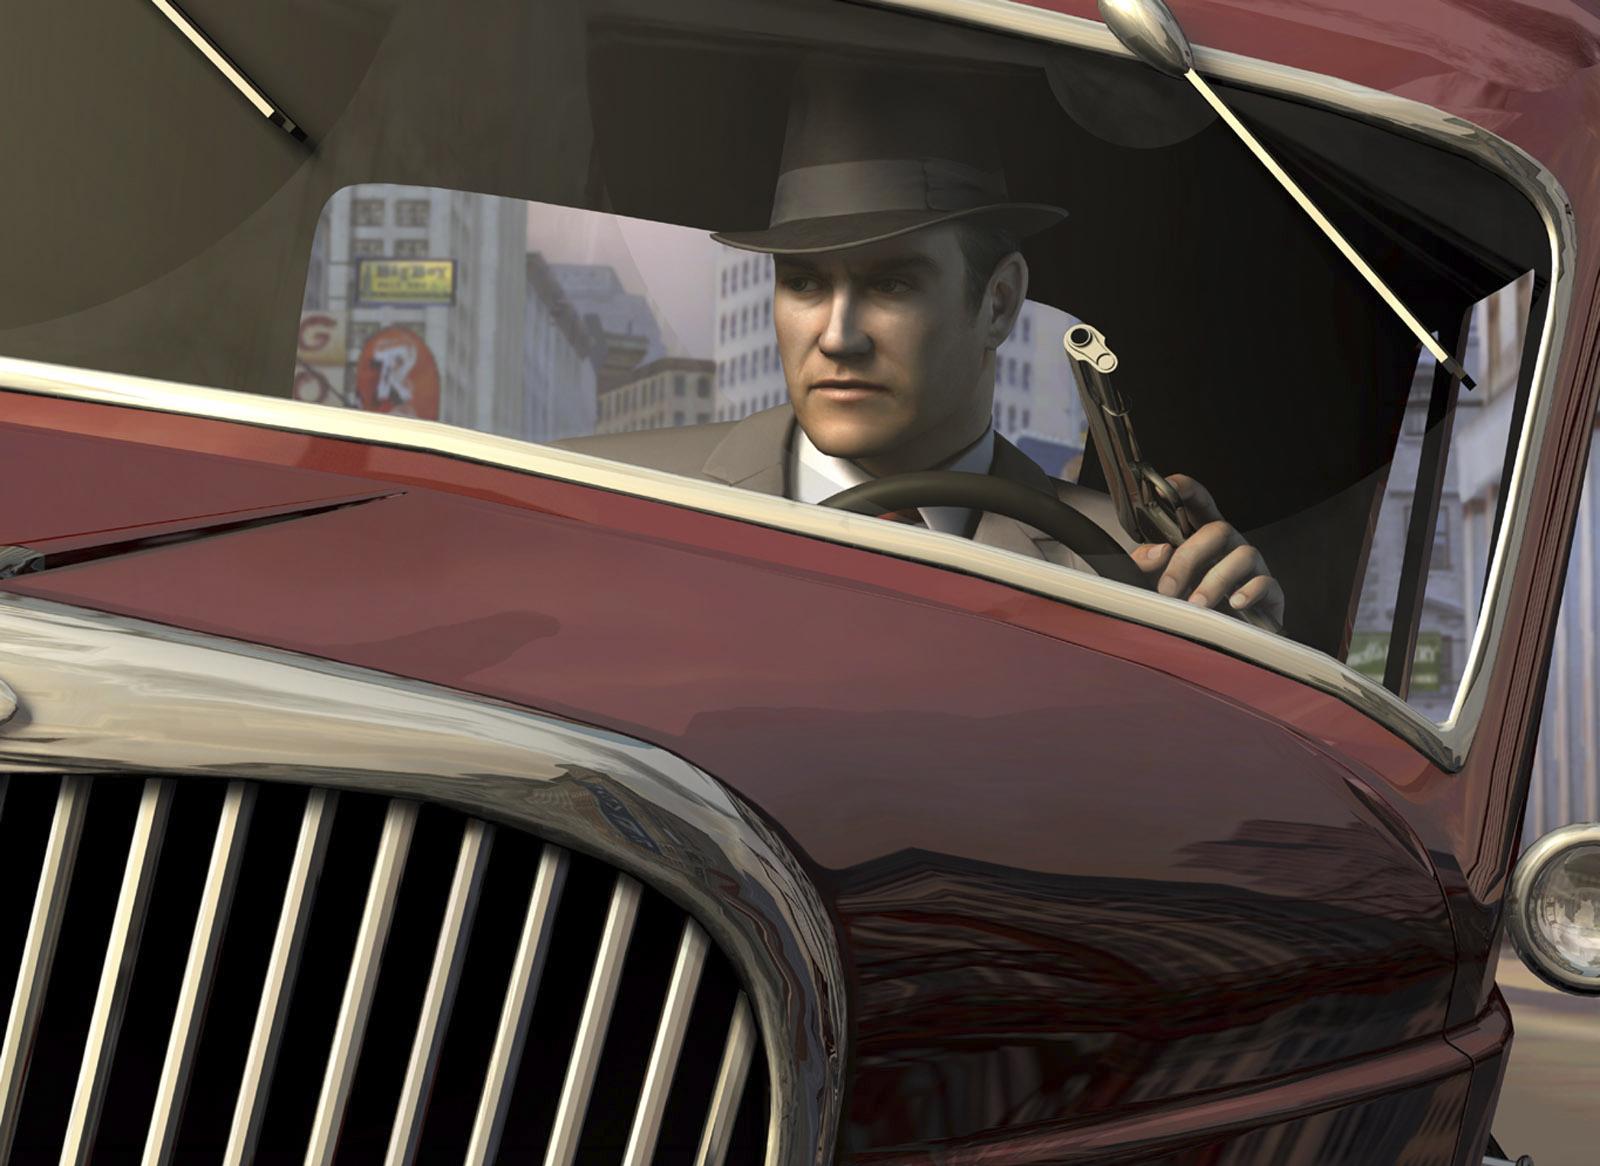 Dll файлы для mafia скачать машины - 4da